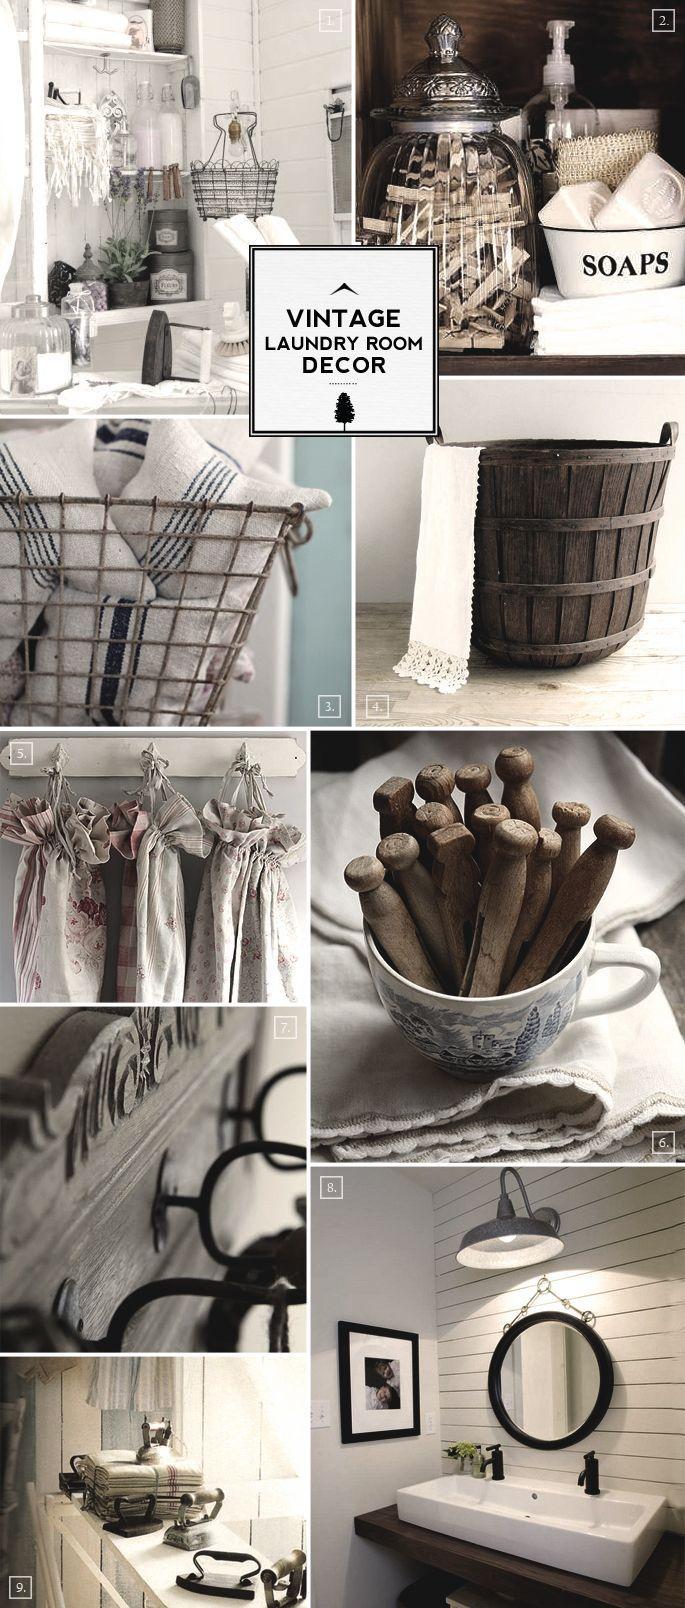 Style Guide Vintage Laundry Room Decor Ideas Vintage Laundry